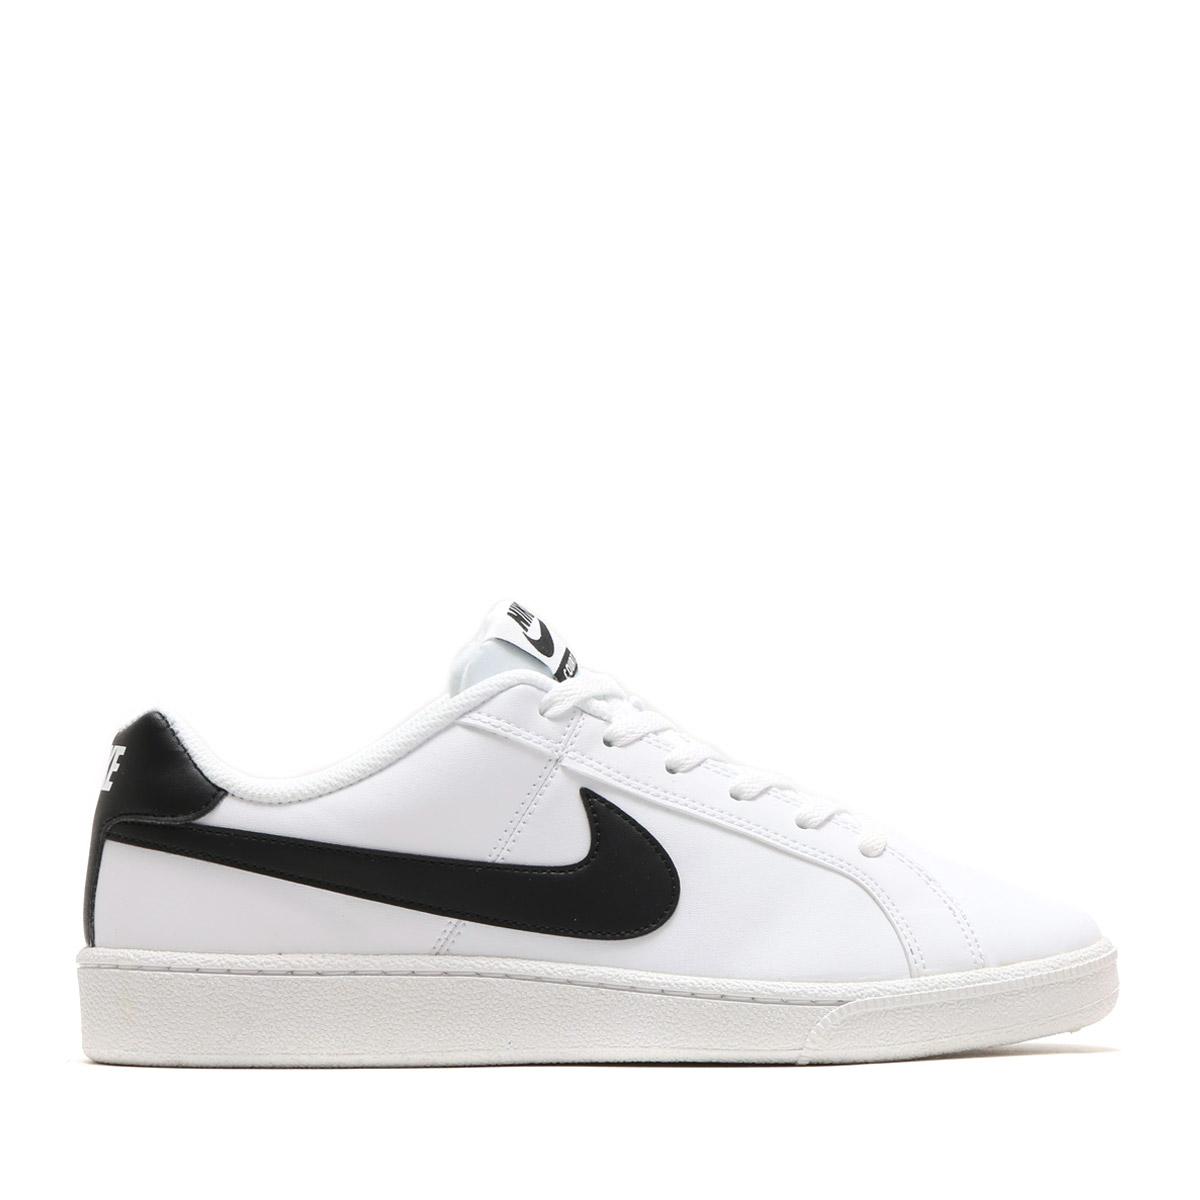 86beae7e0 atmos pink: NIKE COURT ROYALE SL (Nike coat royal SL) WHITE/BLACK ...